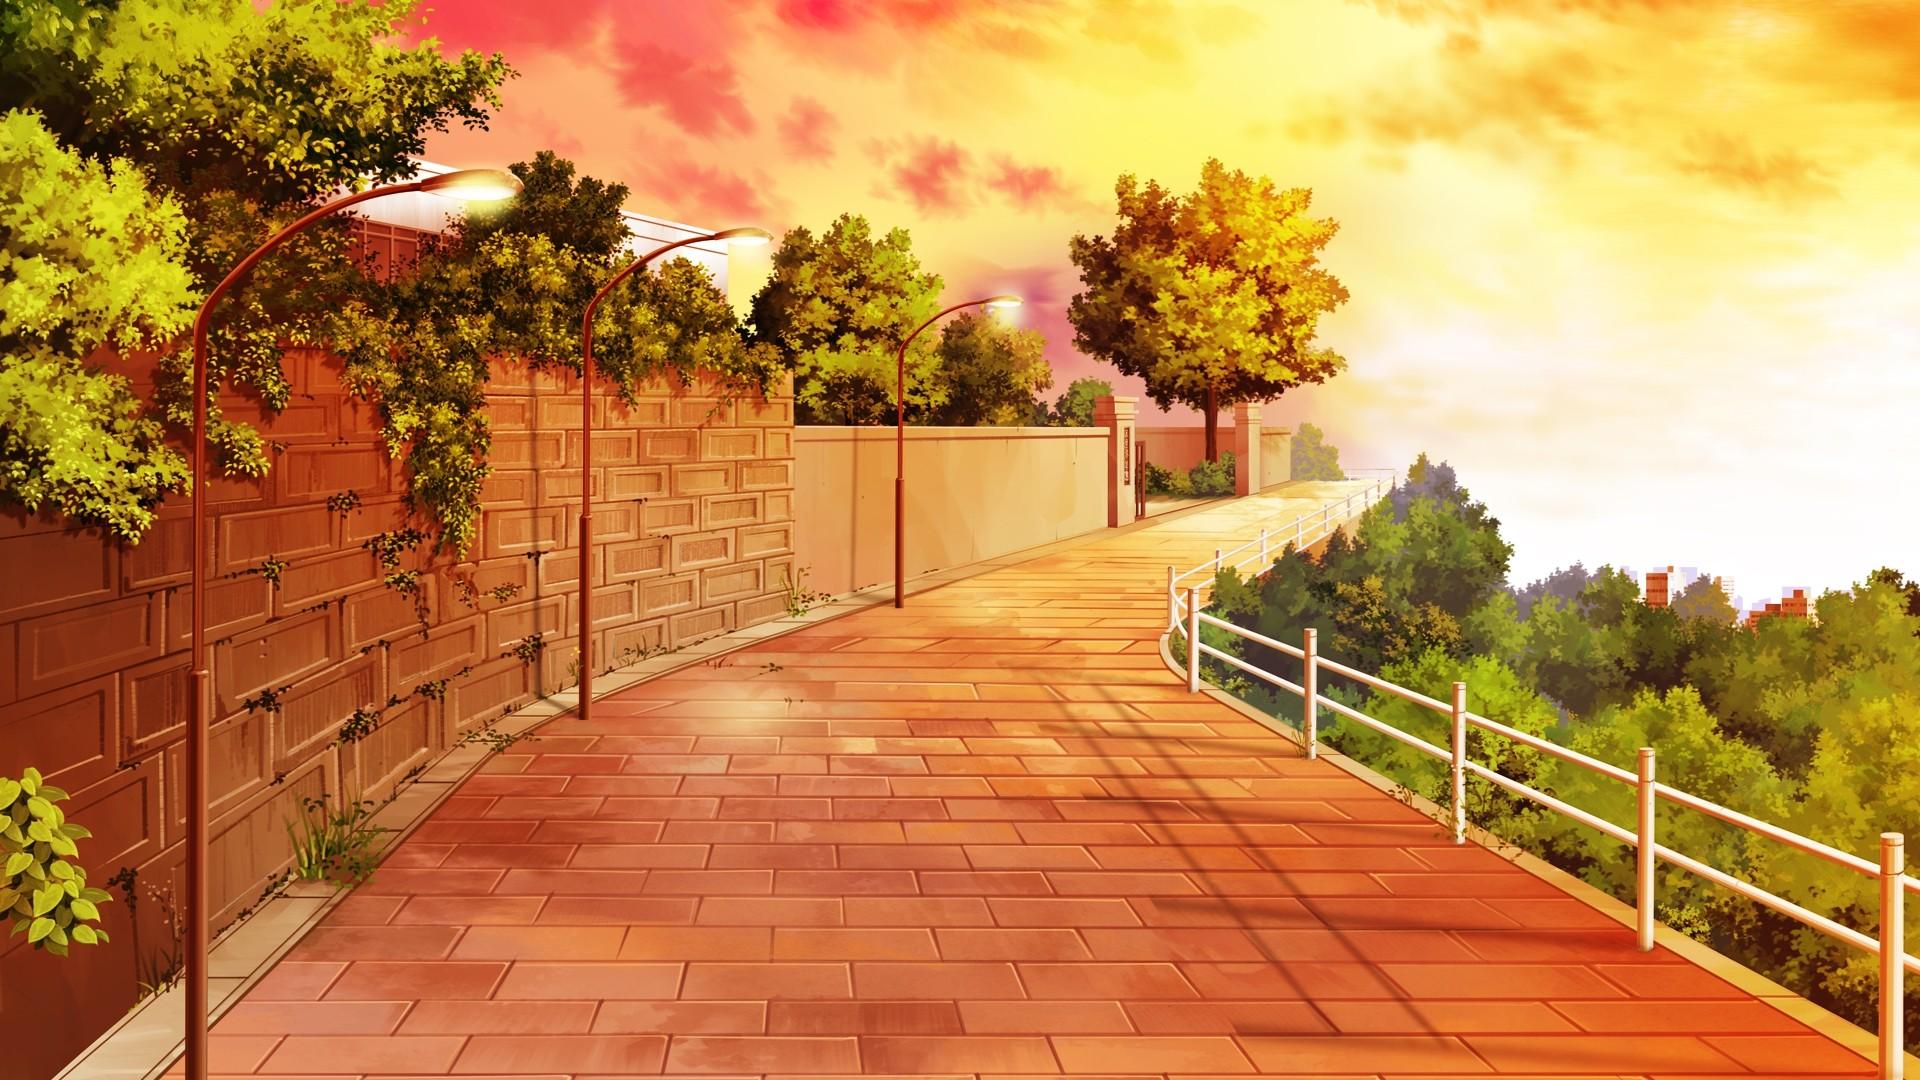 Anime Scenery Background